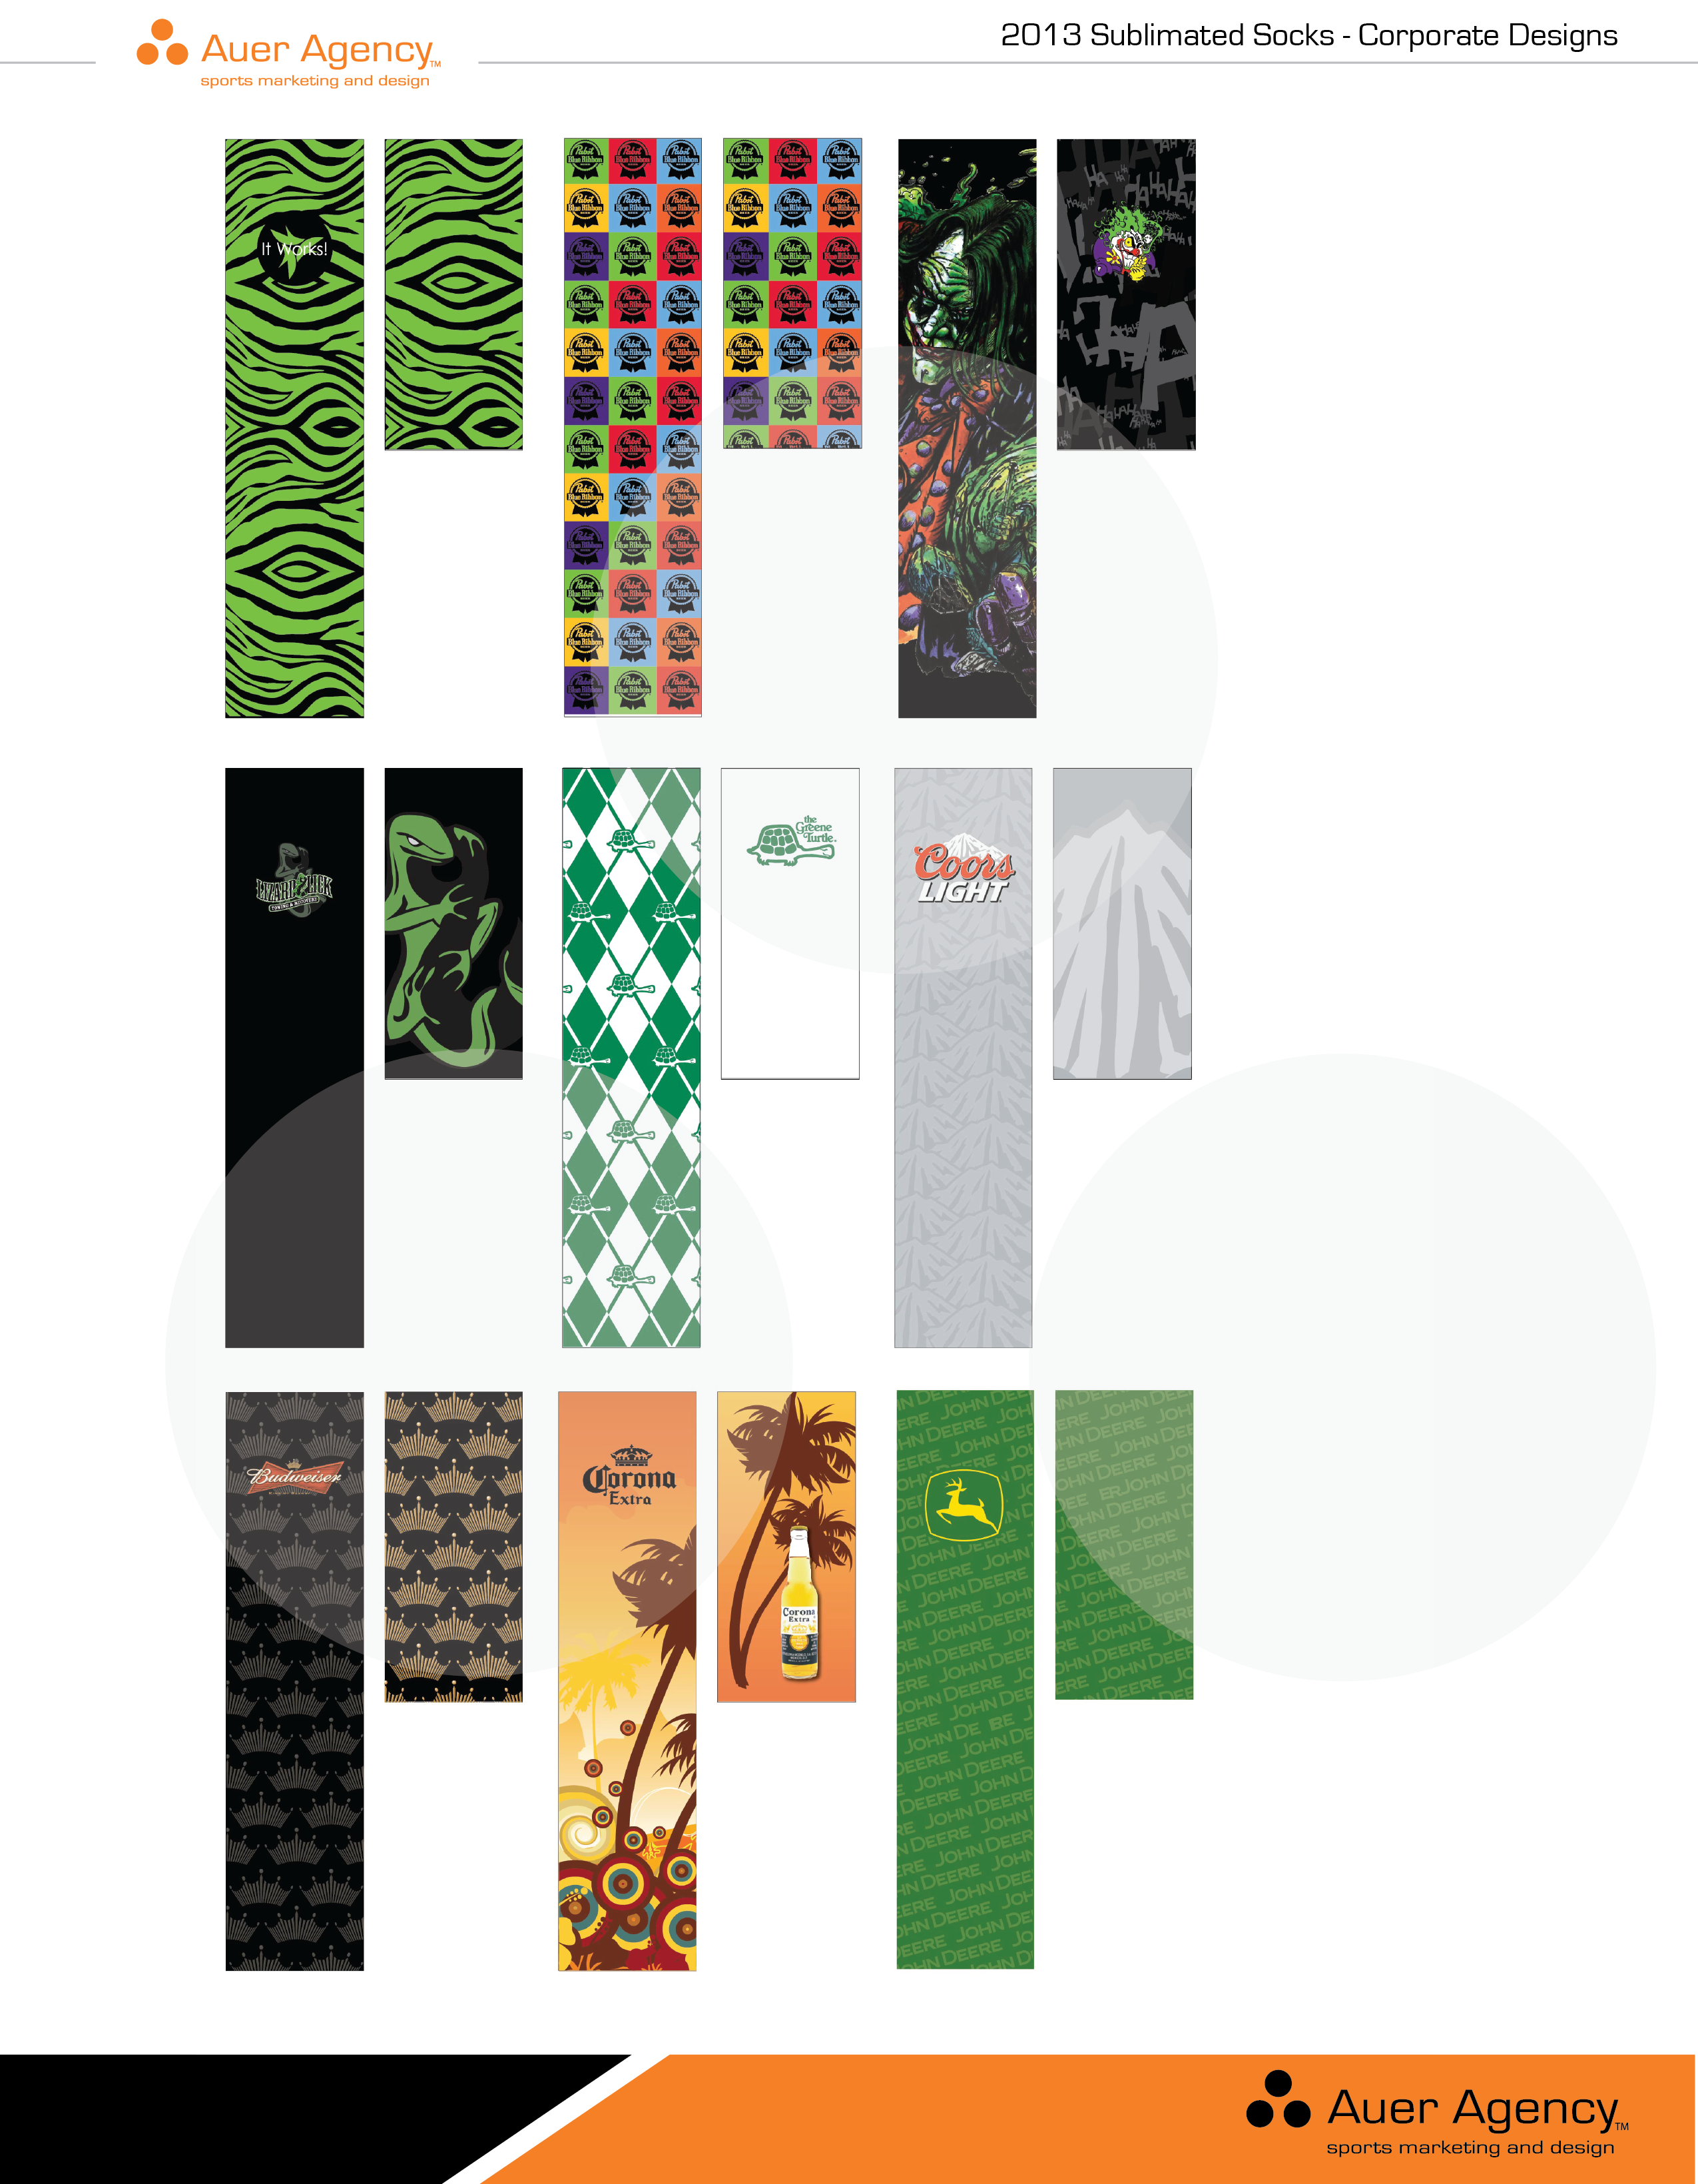 Sub Socks_CorporateDesigns